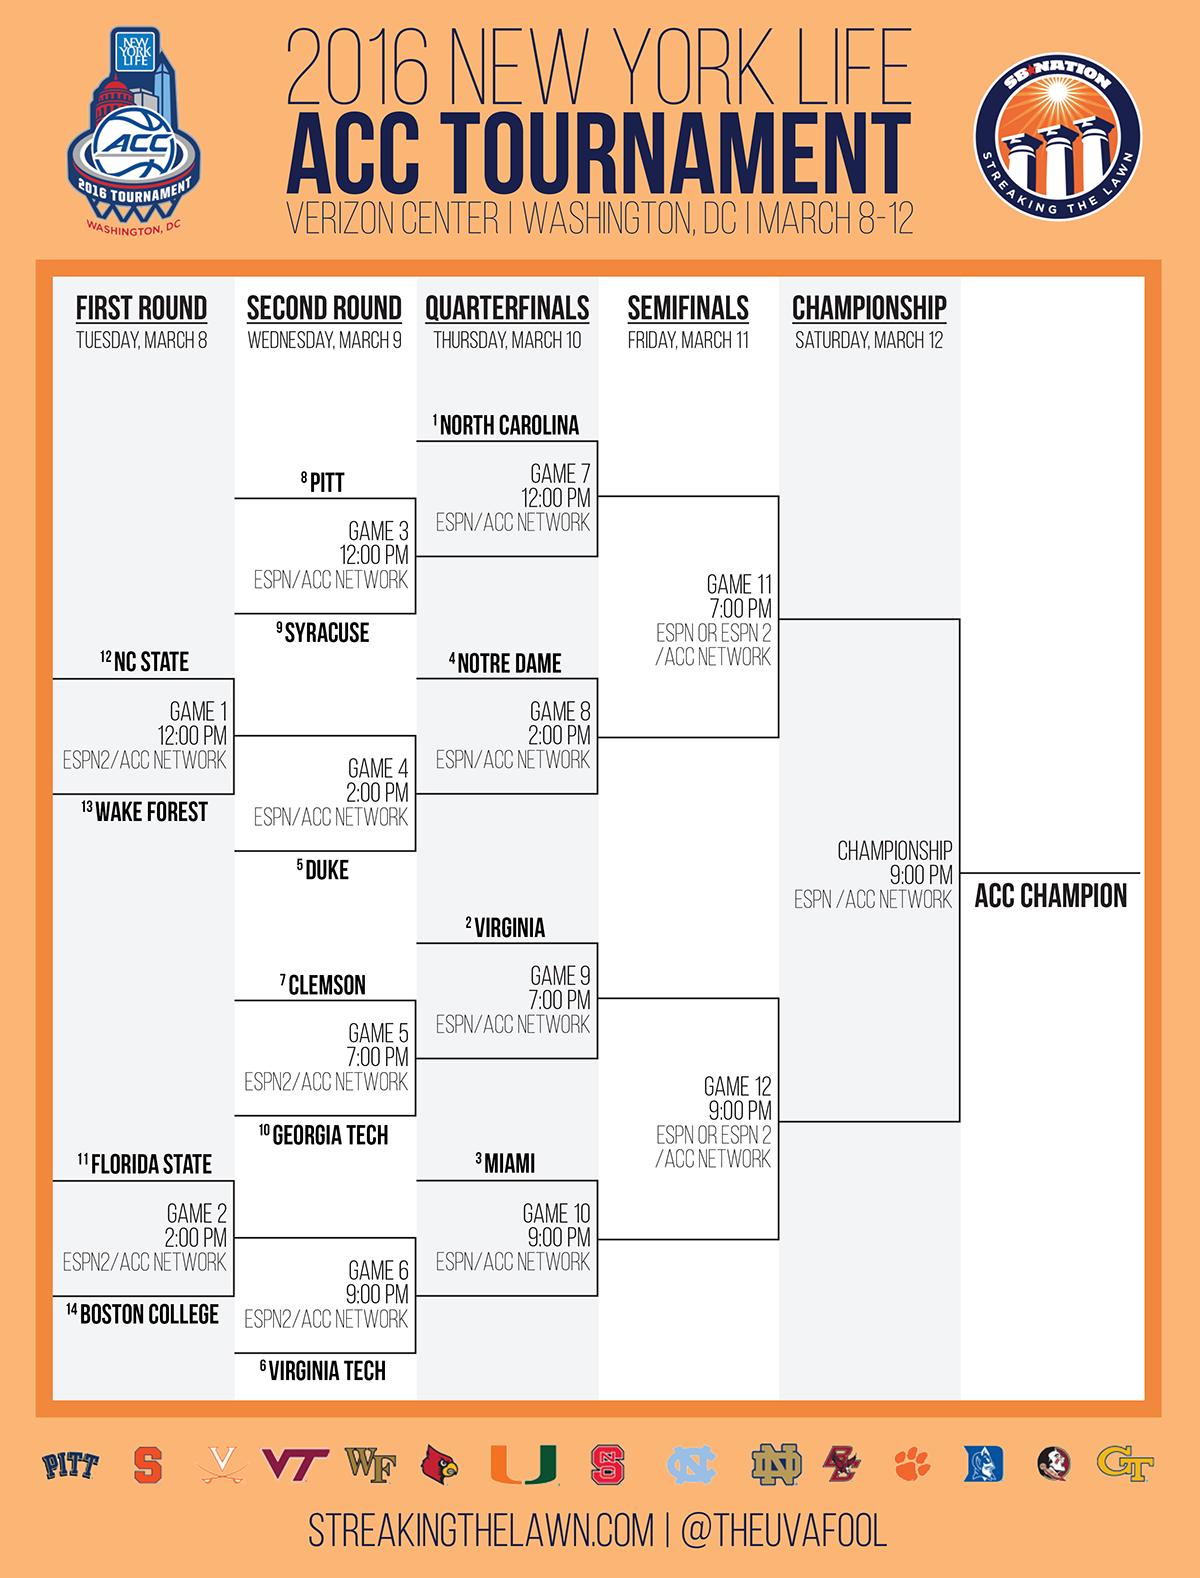 2016 ACC Tournament Bracket